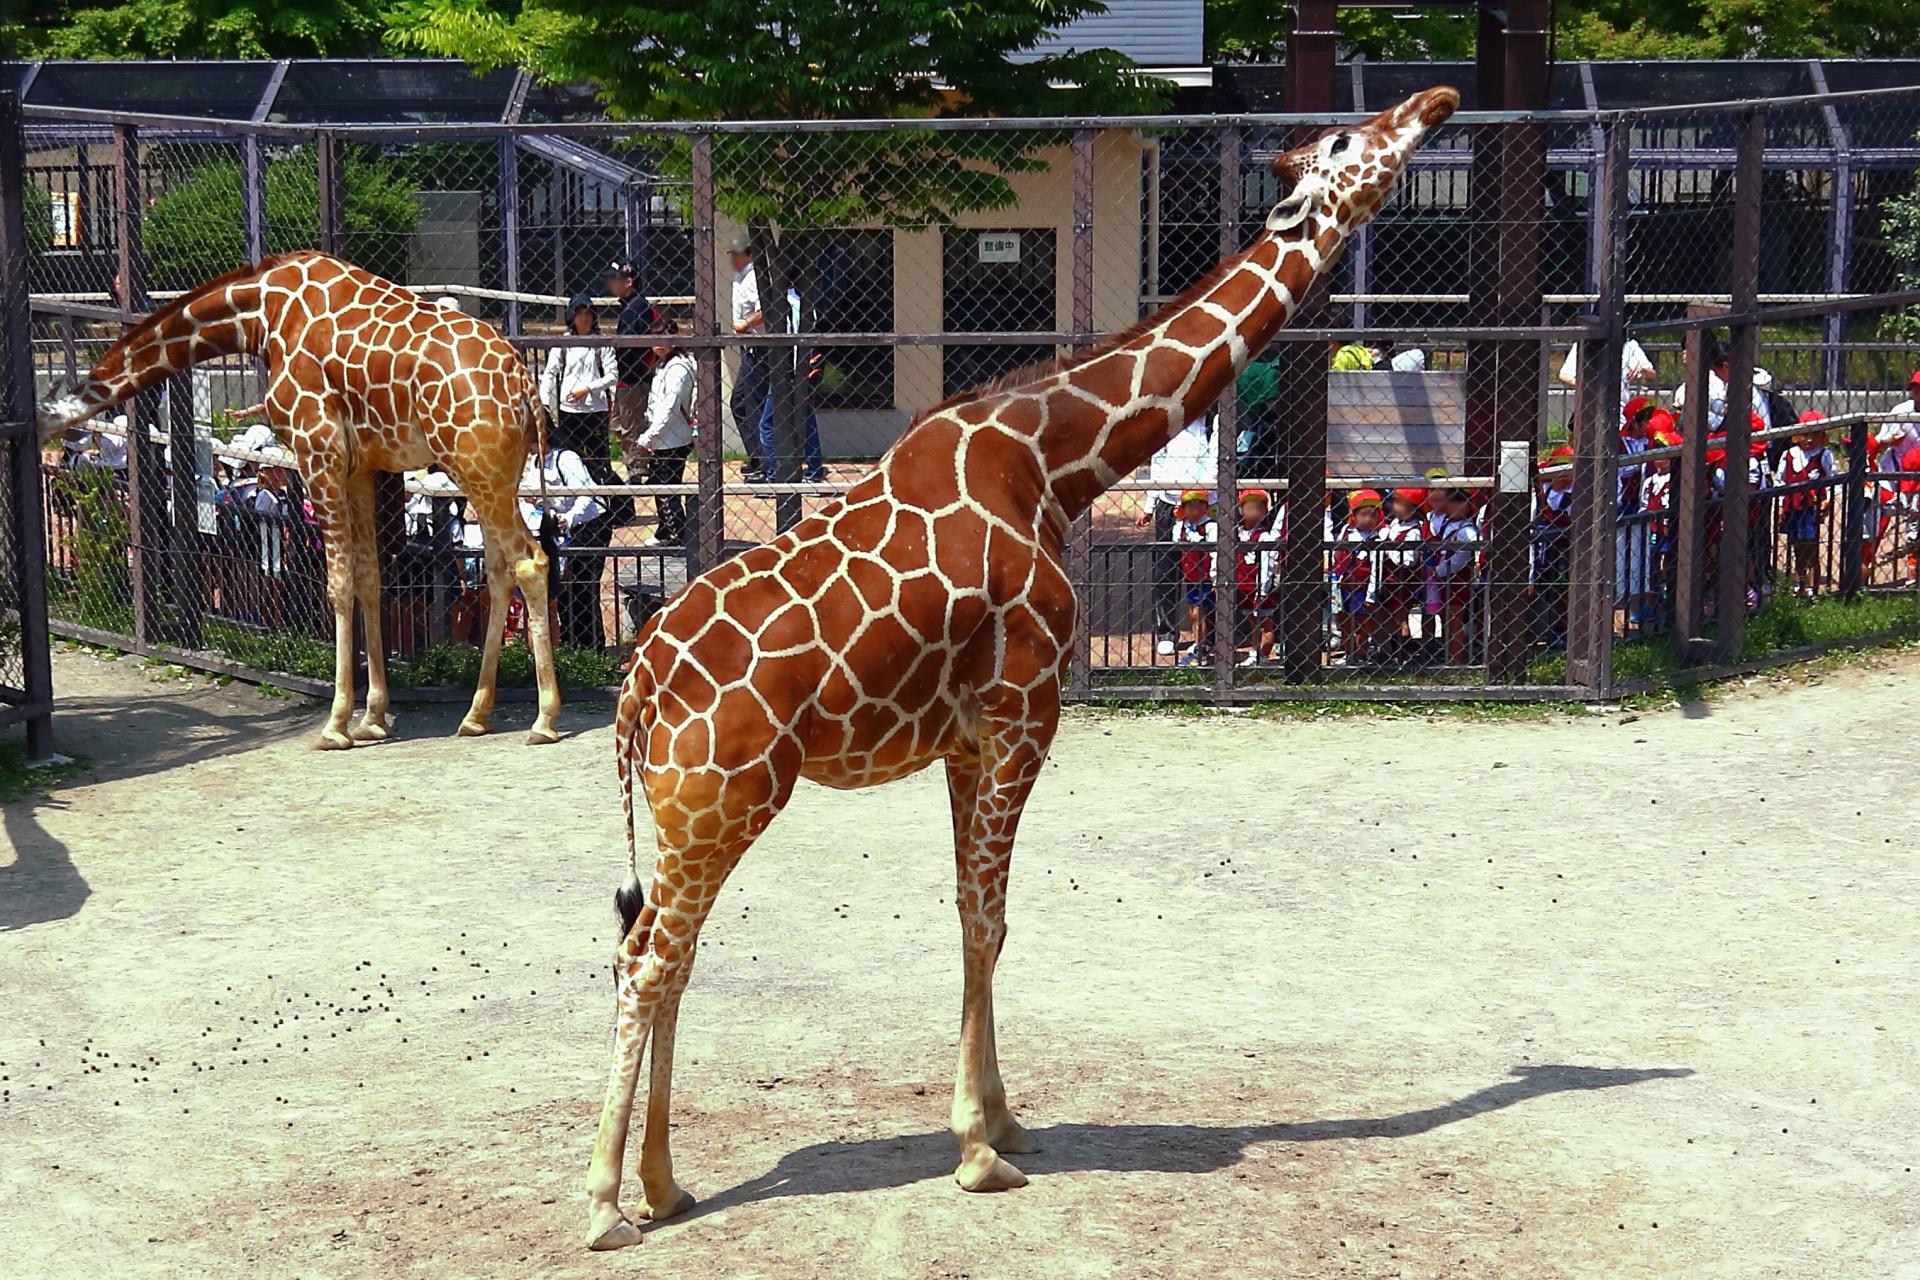 Kyoto City Zoo 京都市動物園(京都・岡崎)の麒麟